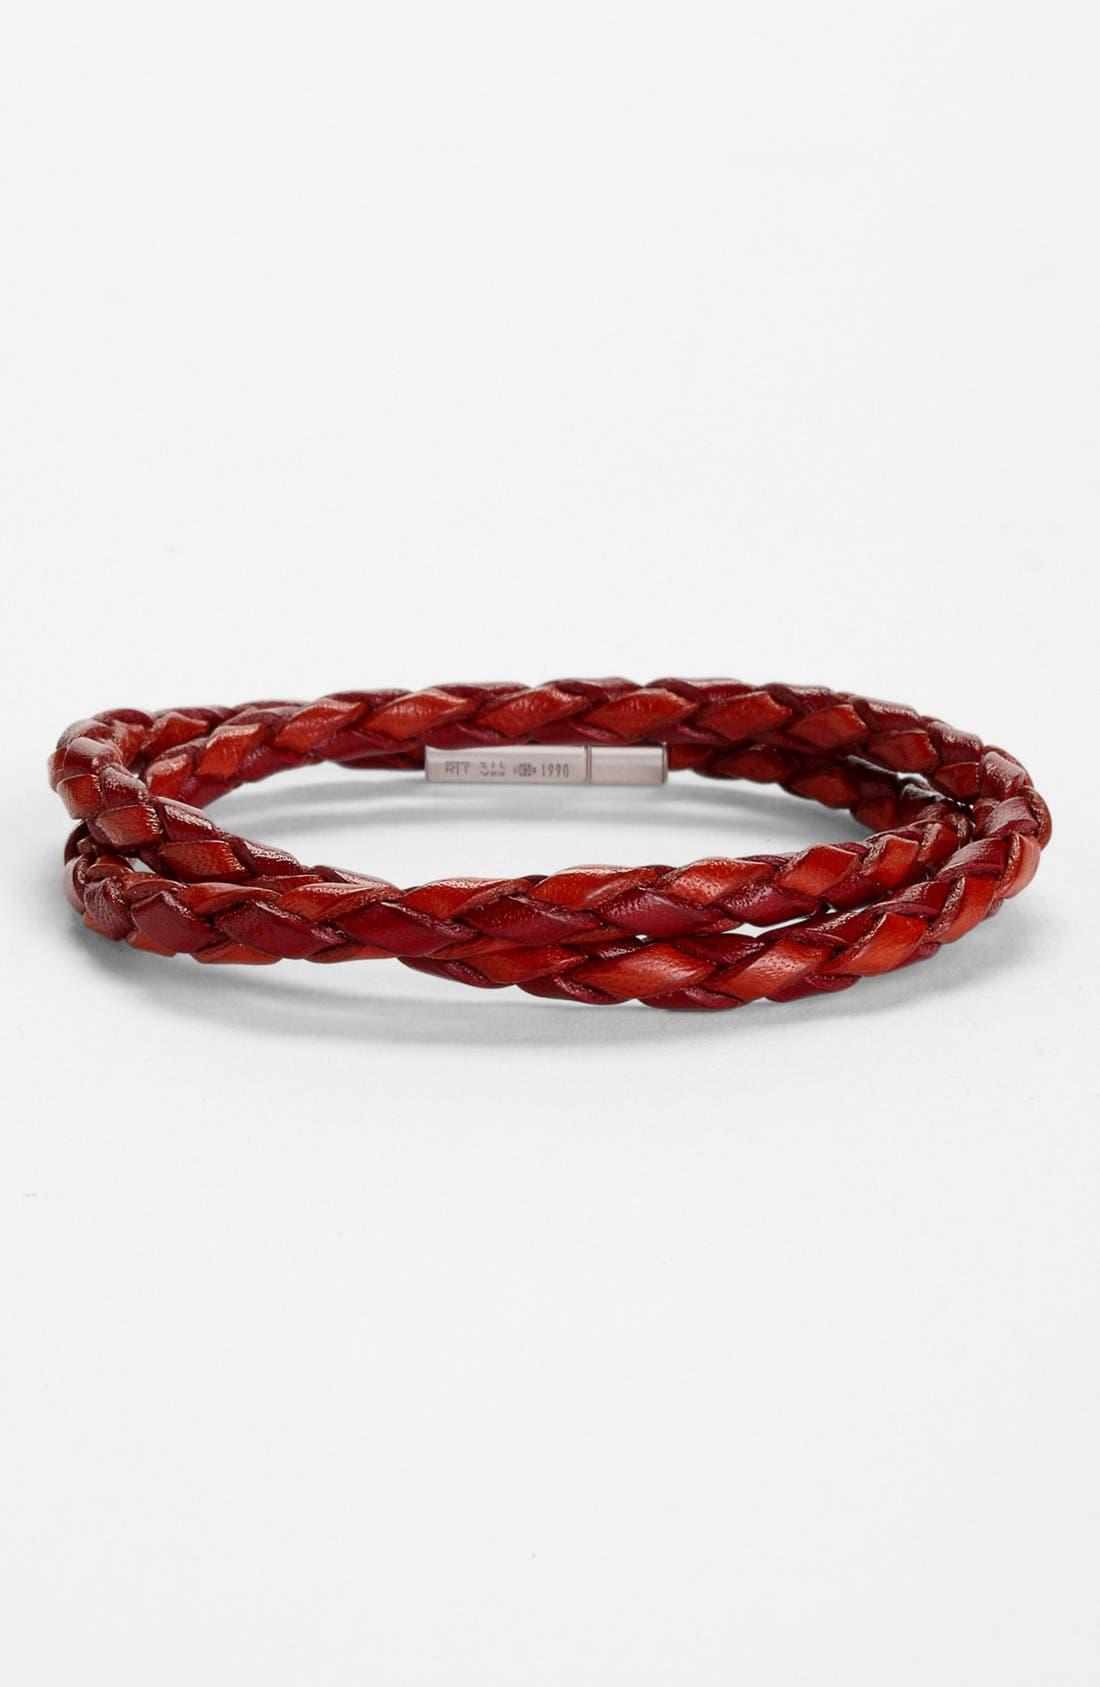 Scoubidou Bracelet,                             Main thumbnail 1, color,                             Red